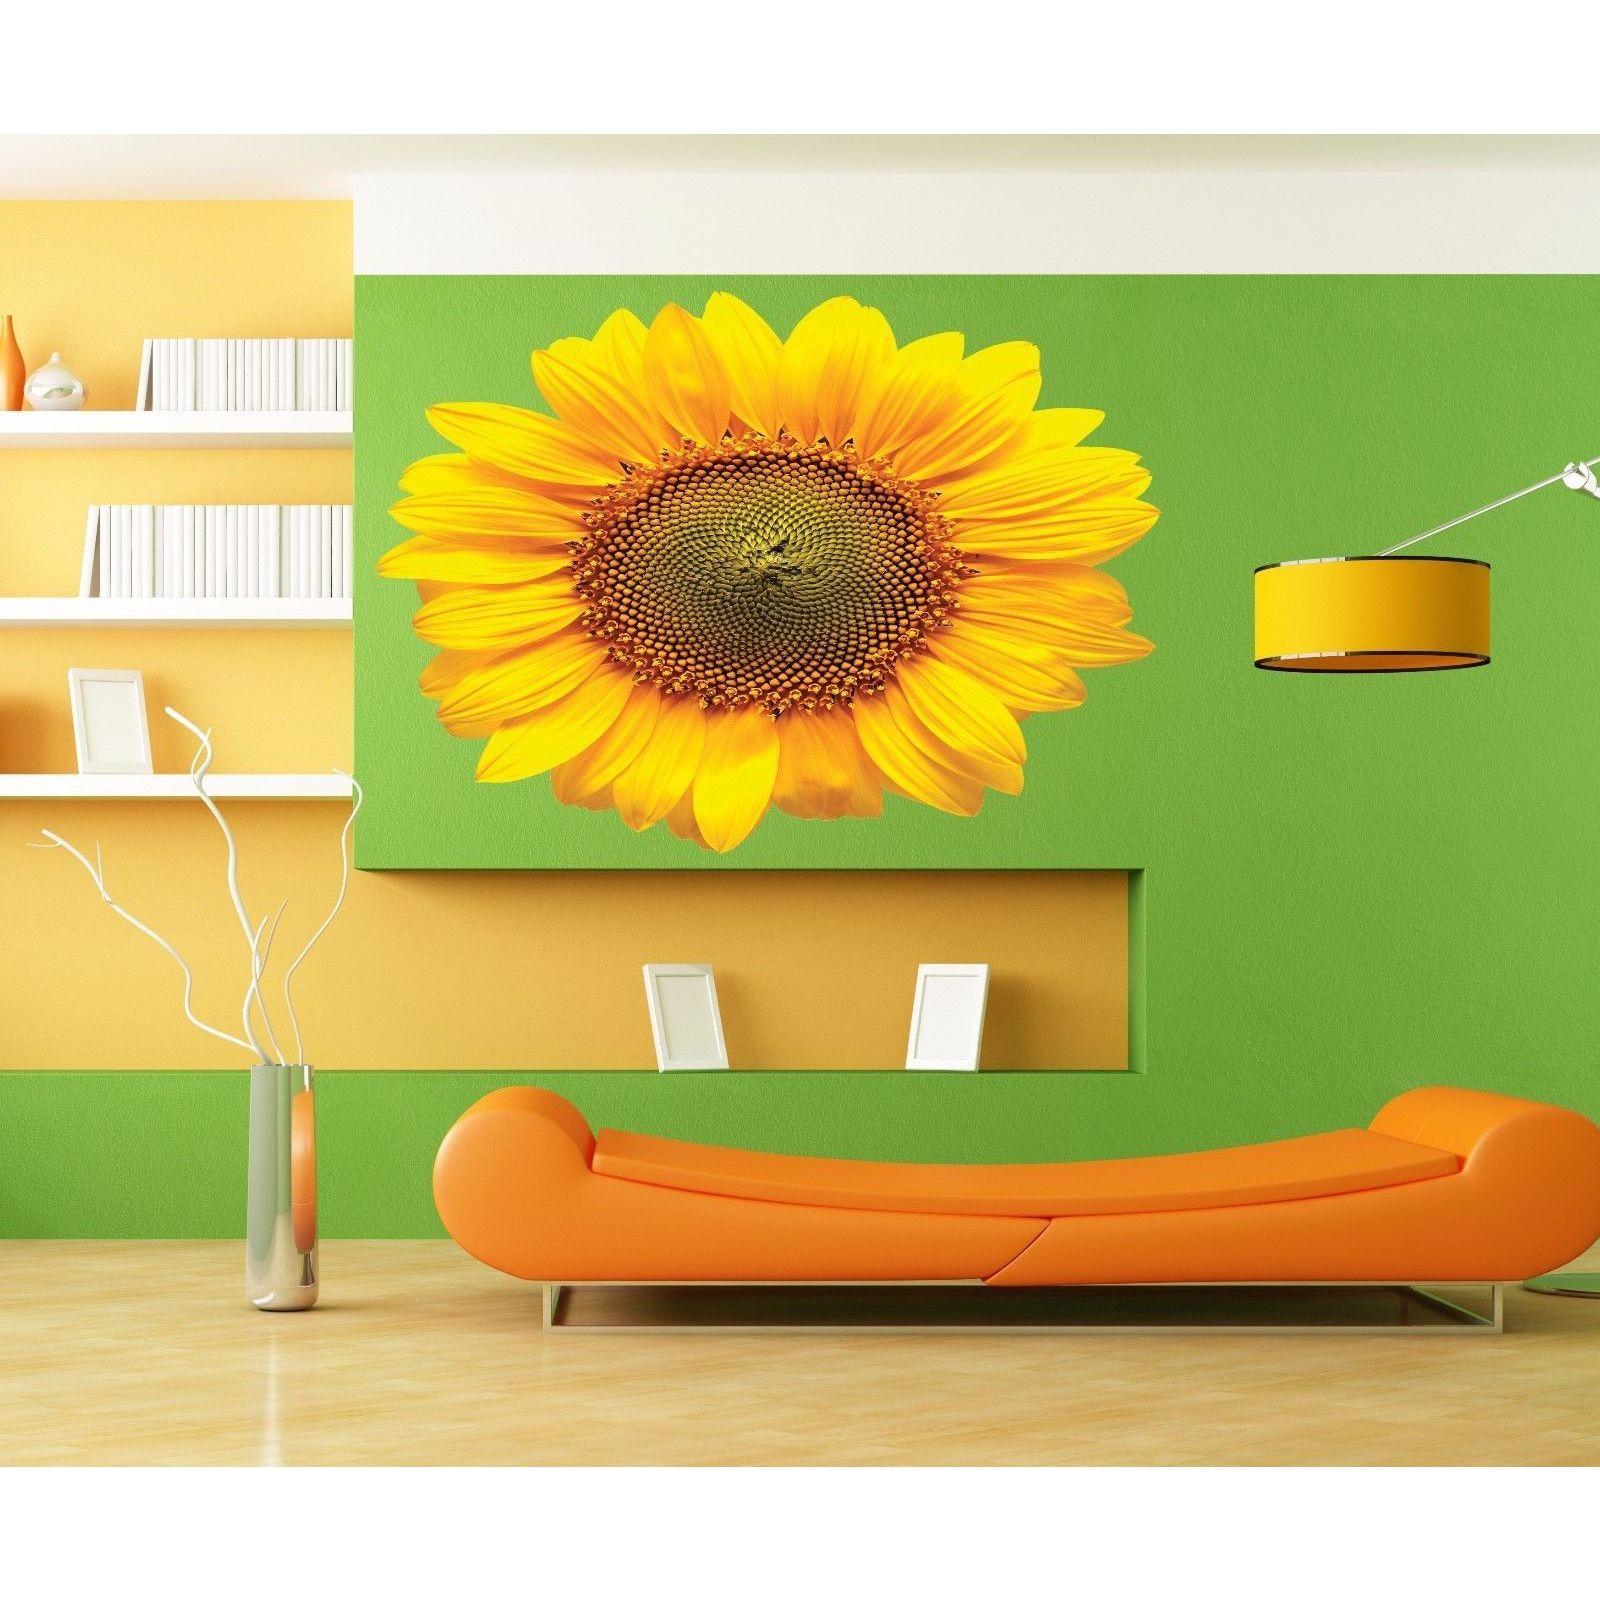 Comfortable Sun Wall Art Photos - The Wall Art Decorations ...